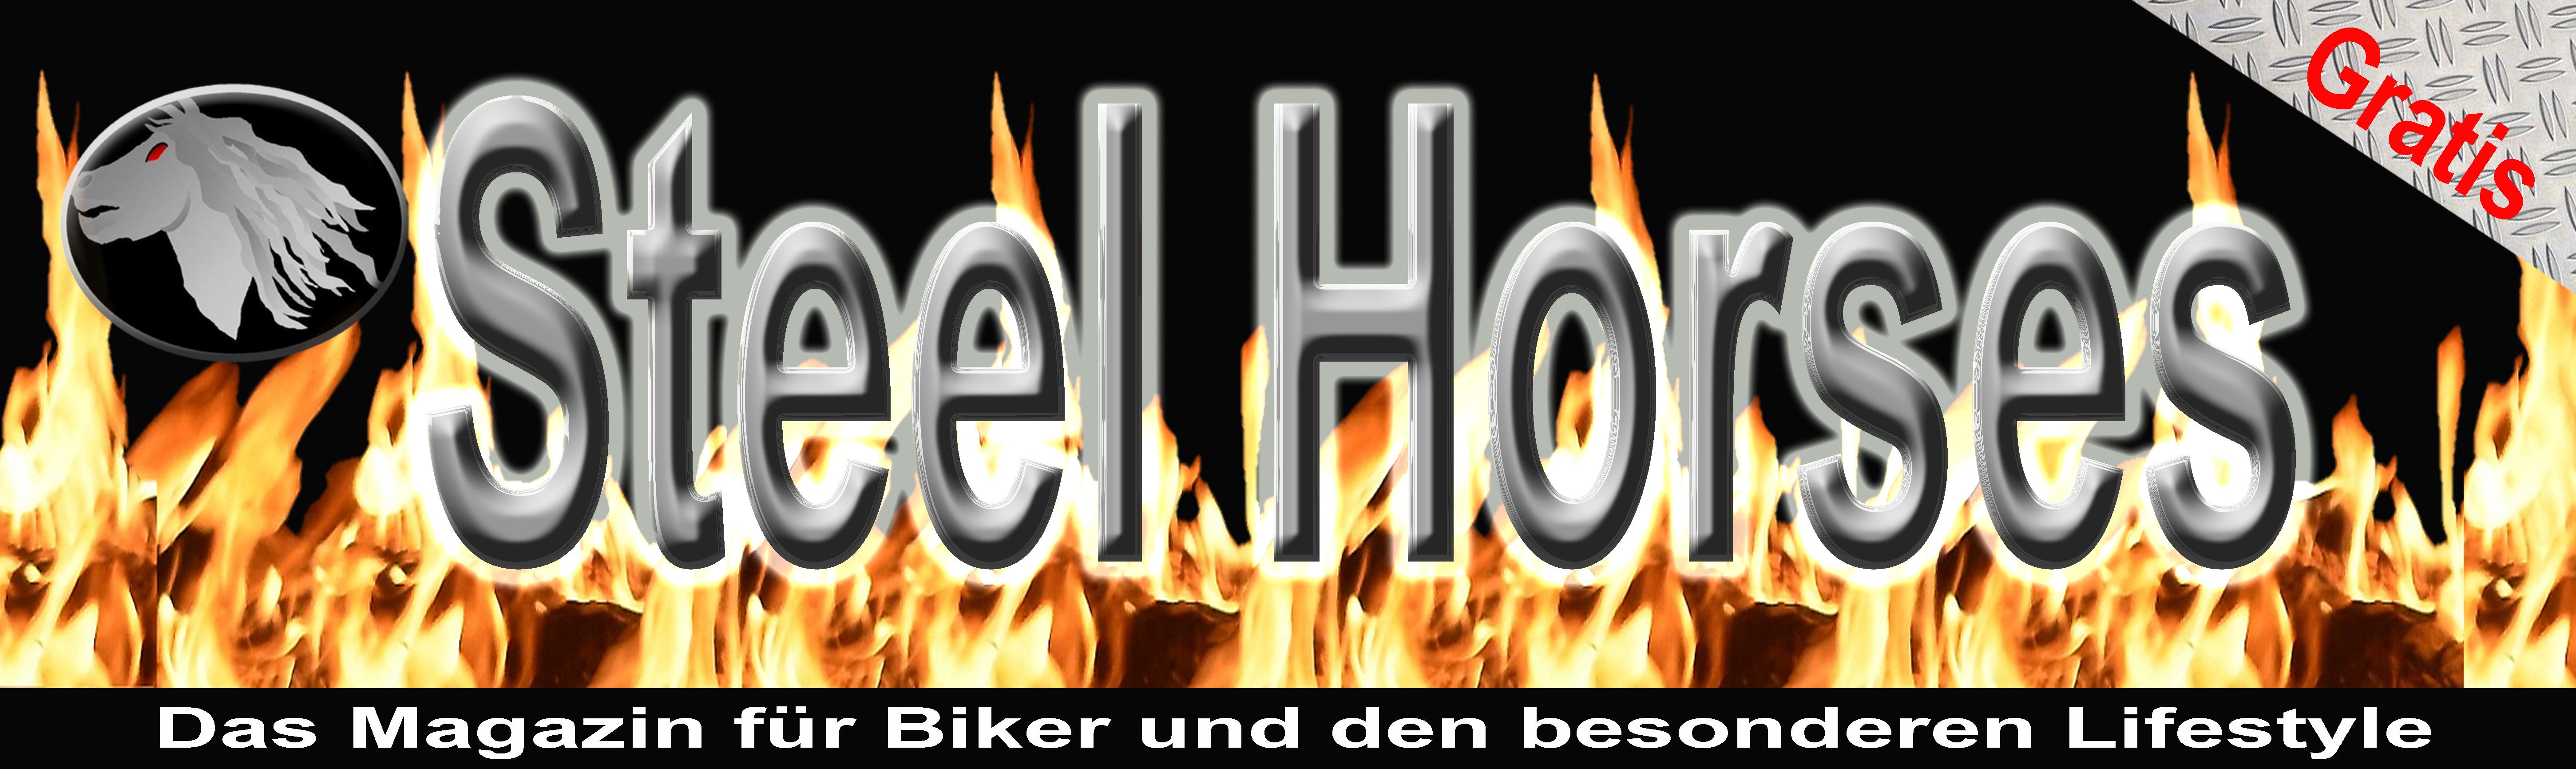 Steel Horses Magazin